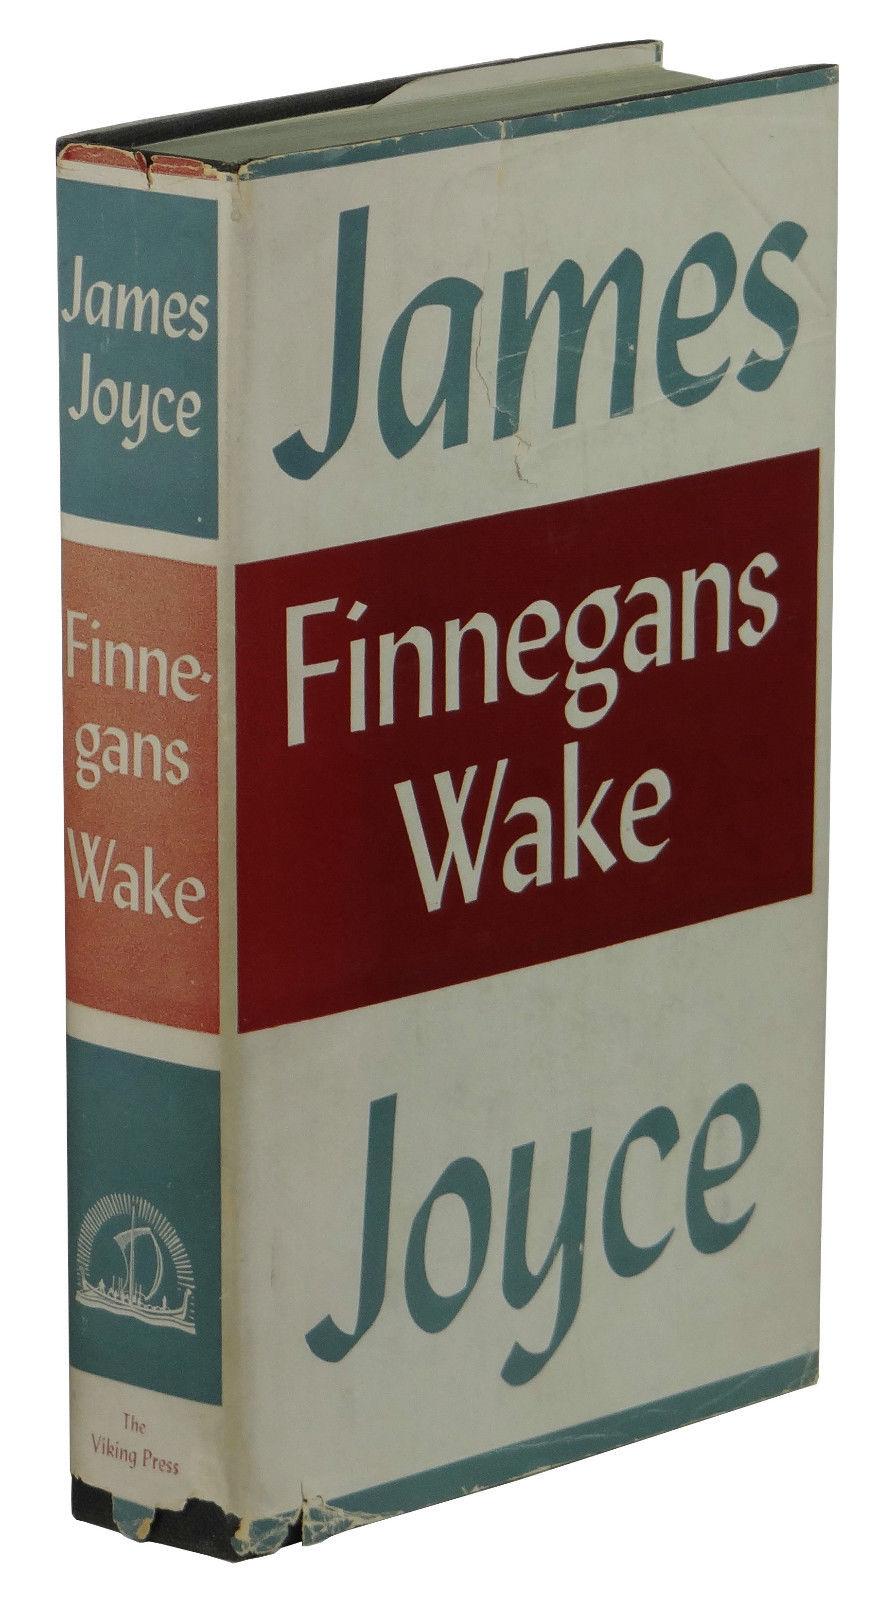 finnegans wake james joyce 1st edition